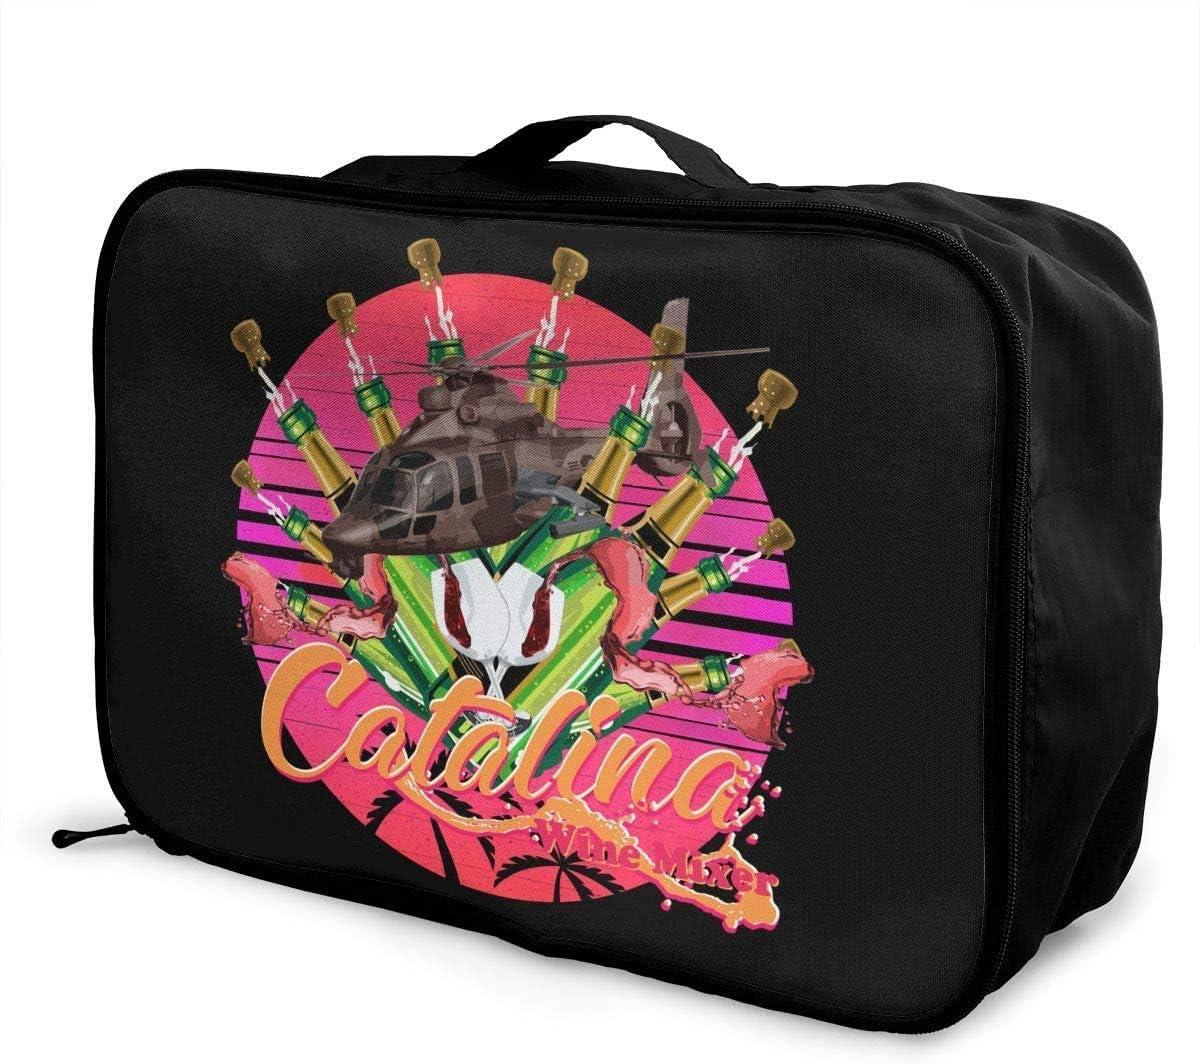 Bolsa de Viaje,Plegable Ligero Bolso Equipaje, Catalina Wine Mixer Travel Lightweight Waterproof Foldable Storage Carry Luggage Duffle Tote Bag